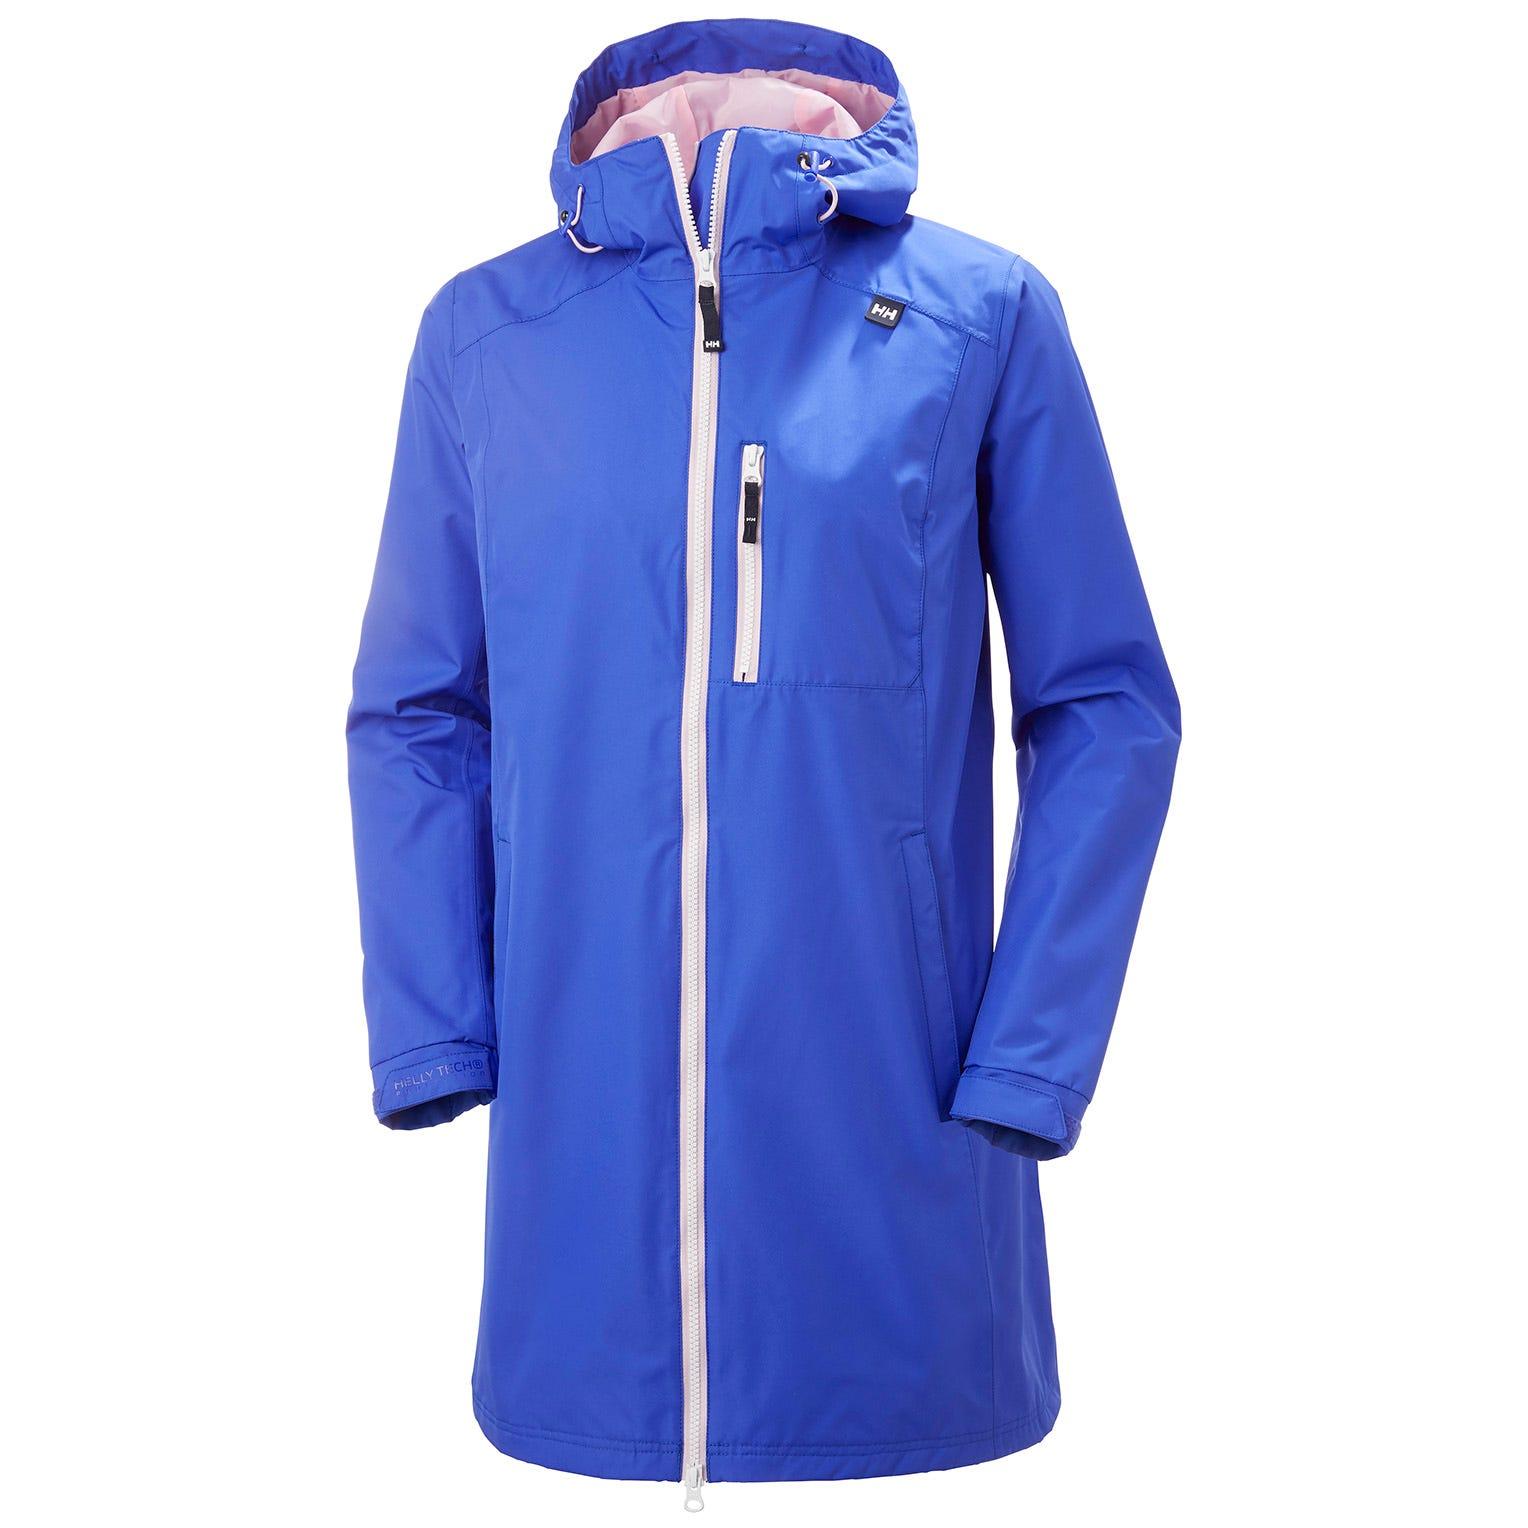 Womens Long Belfast 3/4 Length Rain Jacket | Helly Hansen Womens Blue S